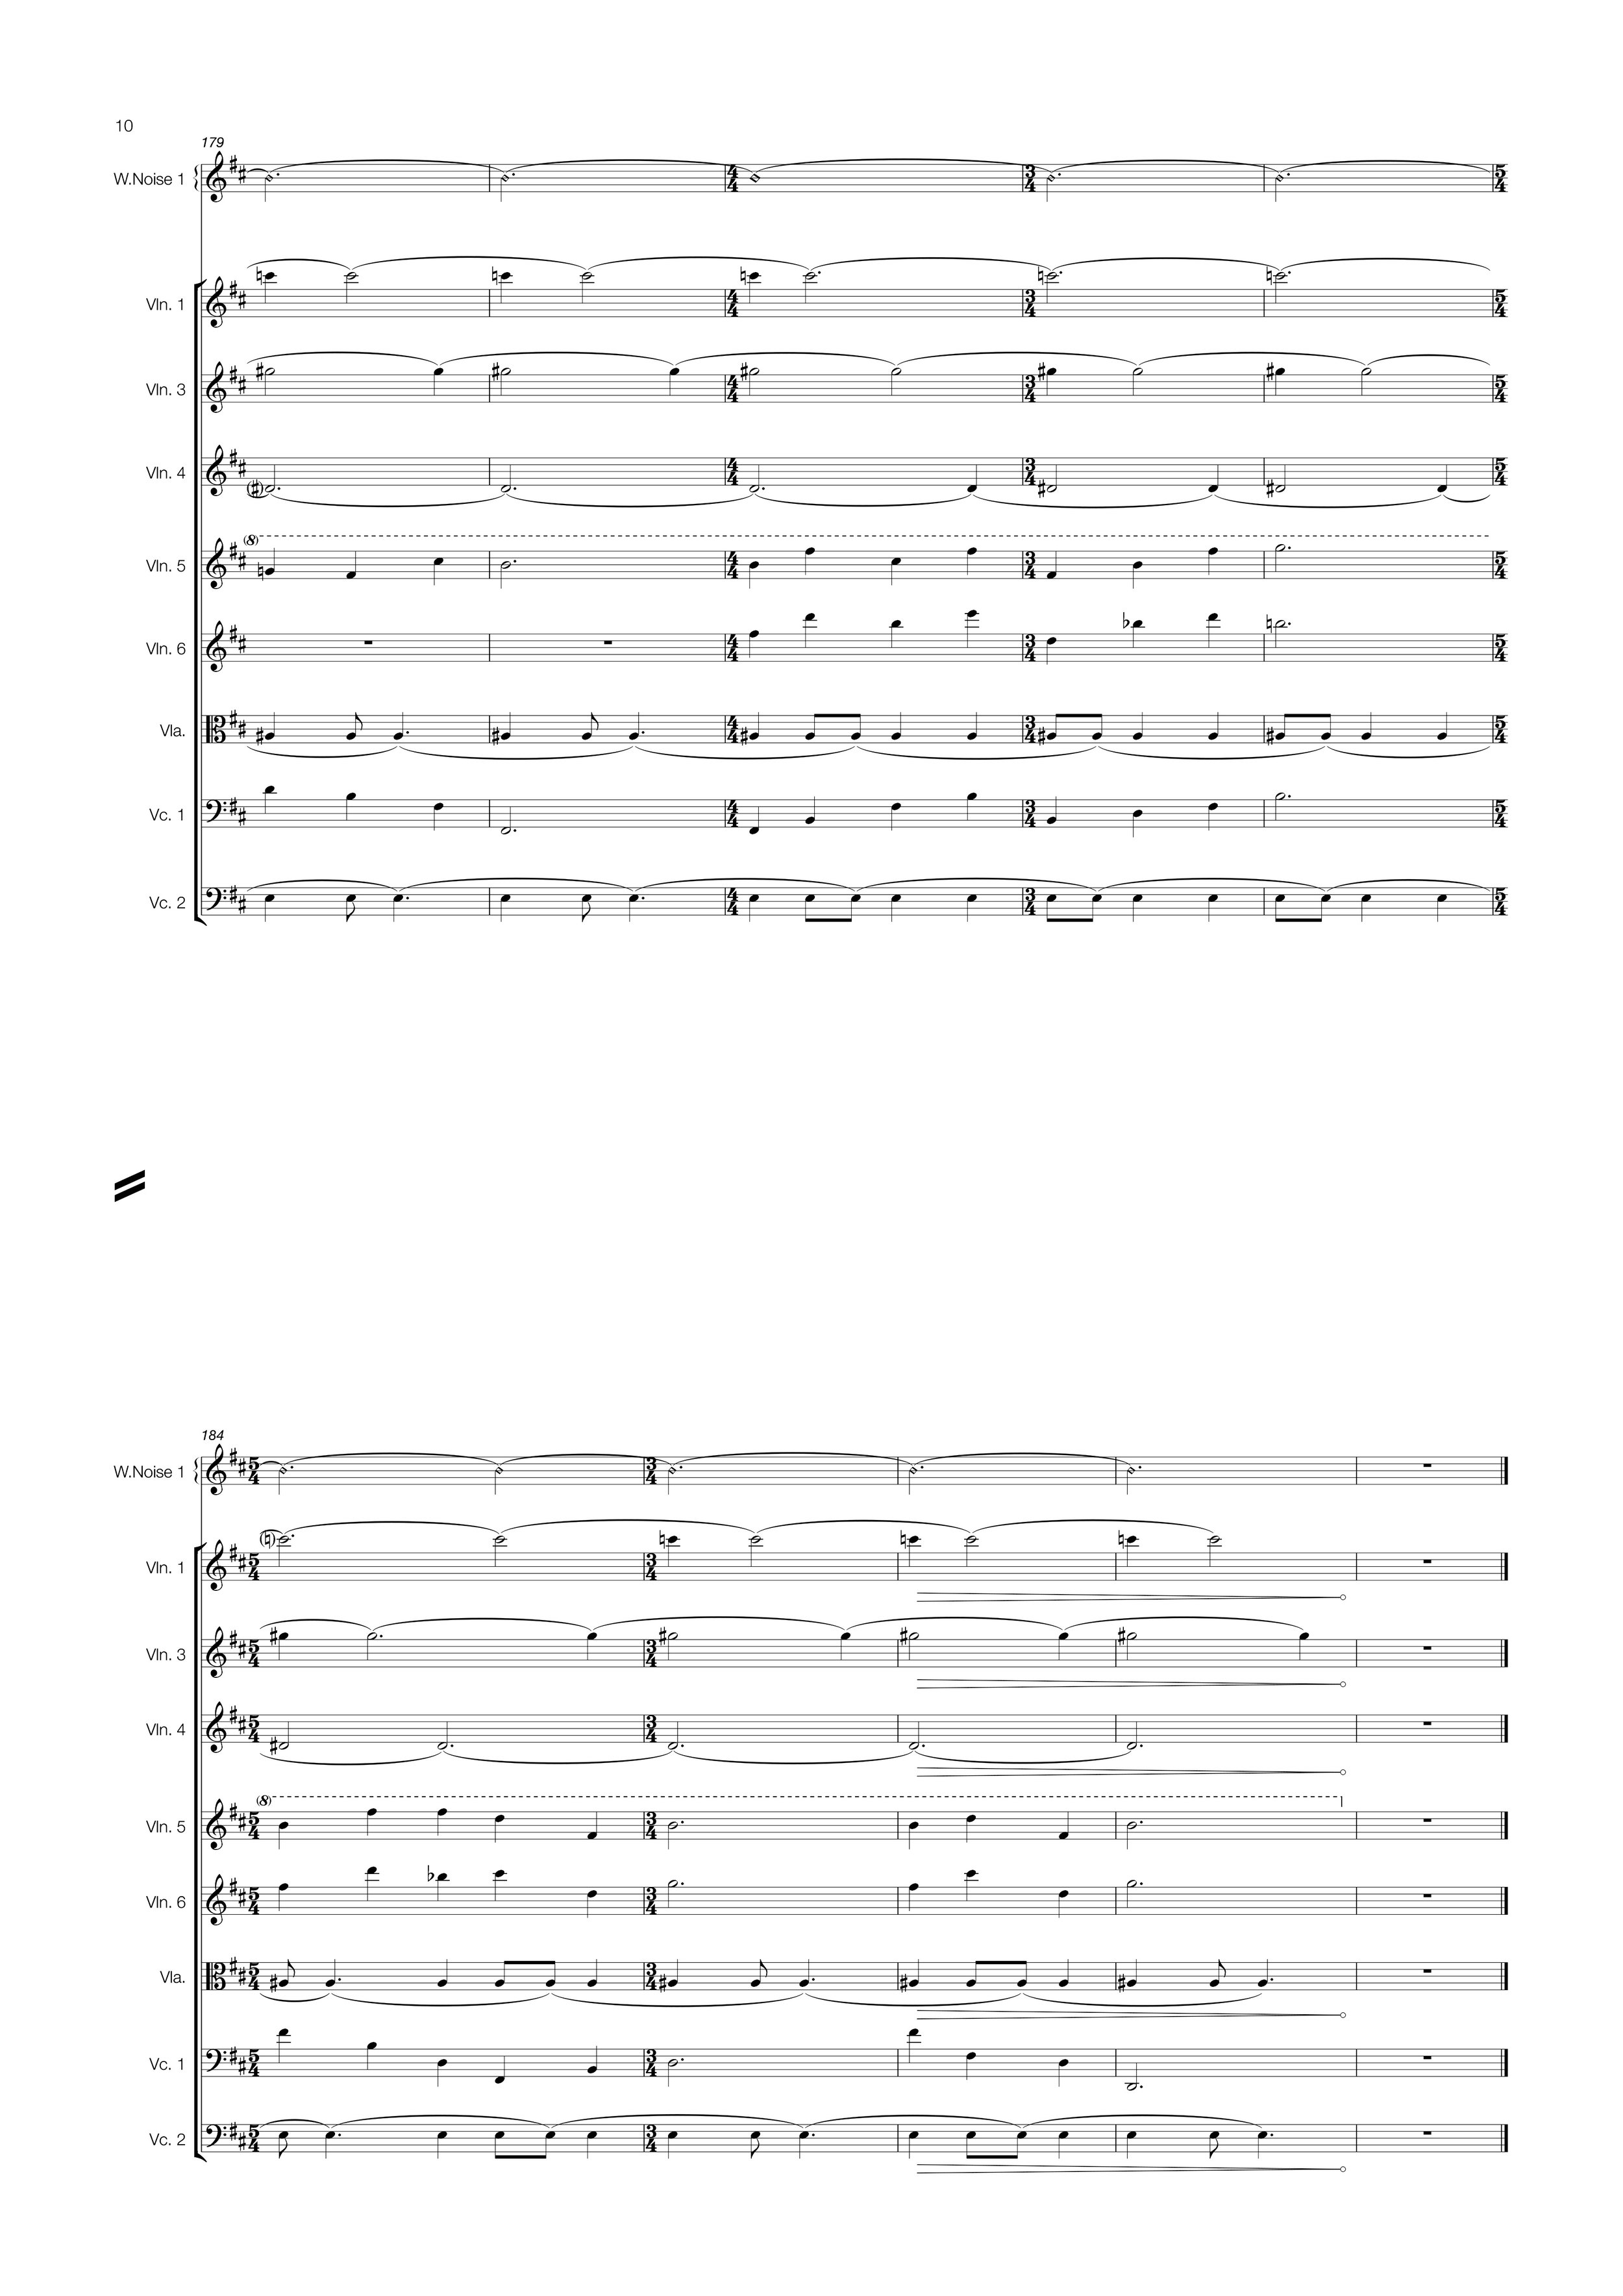 Elliptically Elliptical Score Page 12.jpg